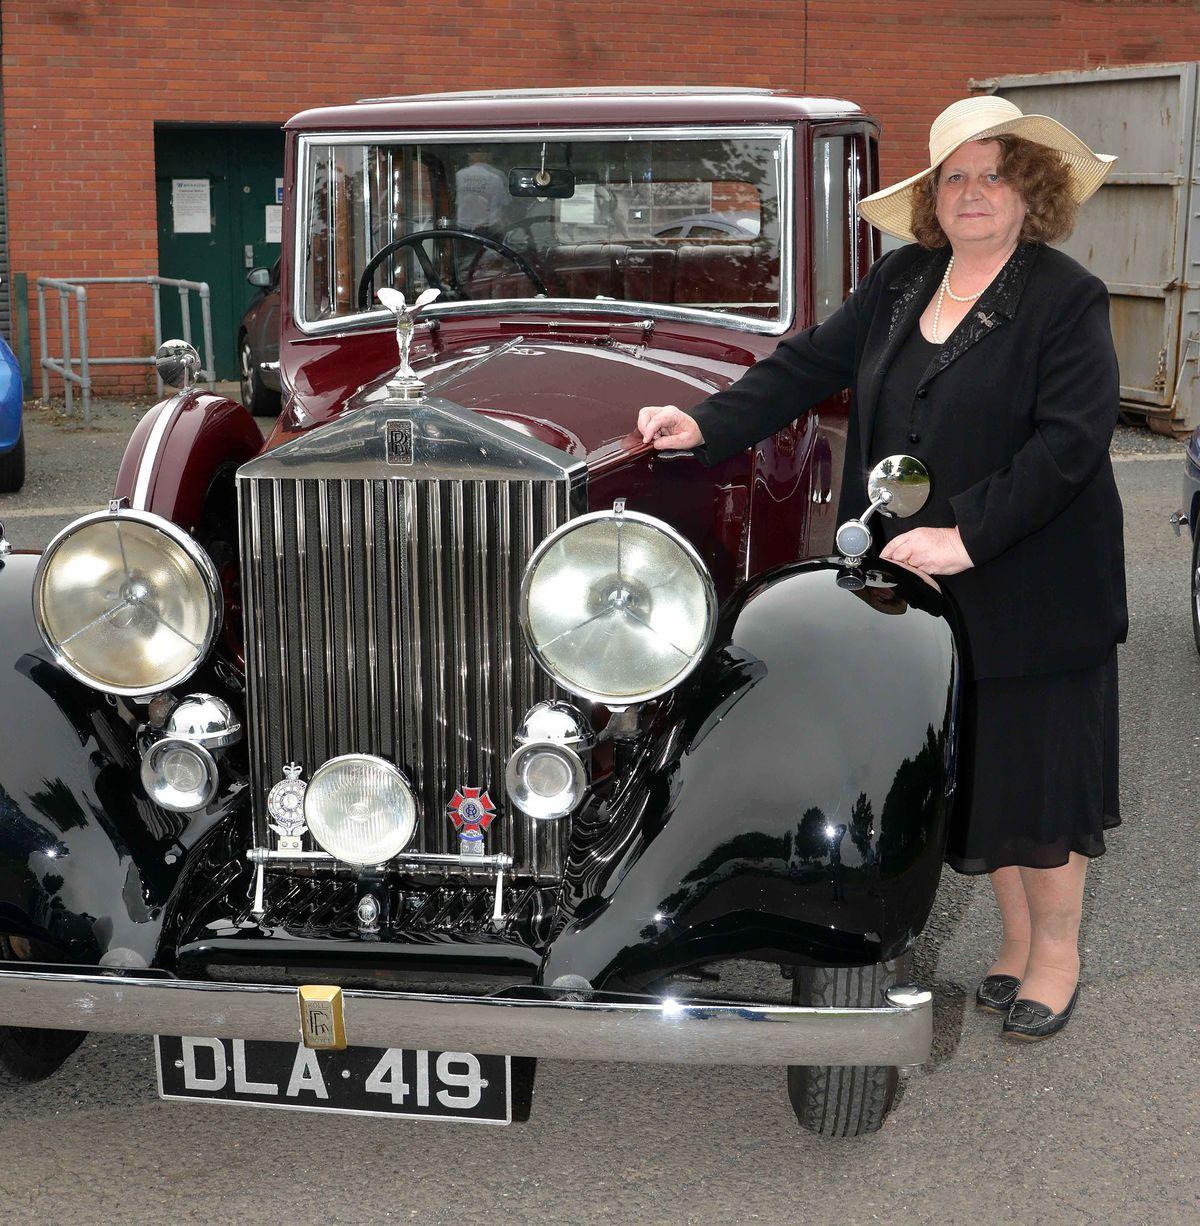 Diane Waldron with her 1936 Rolls Royce 25/30 car